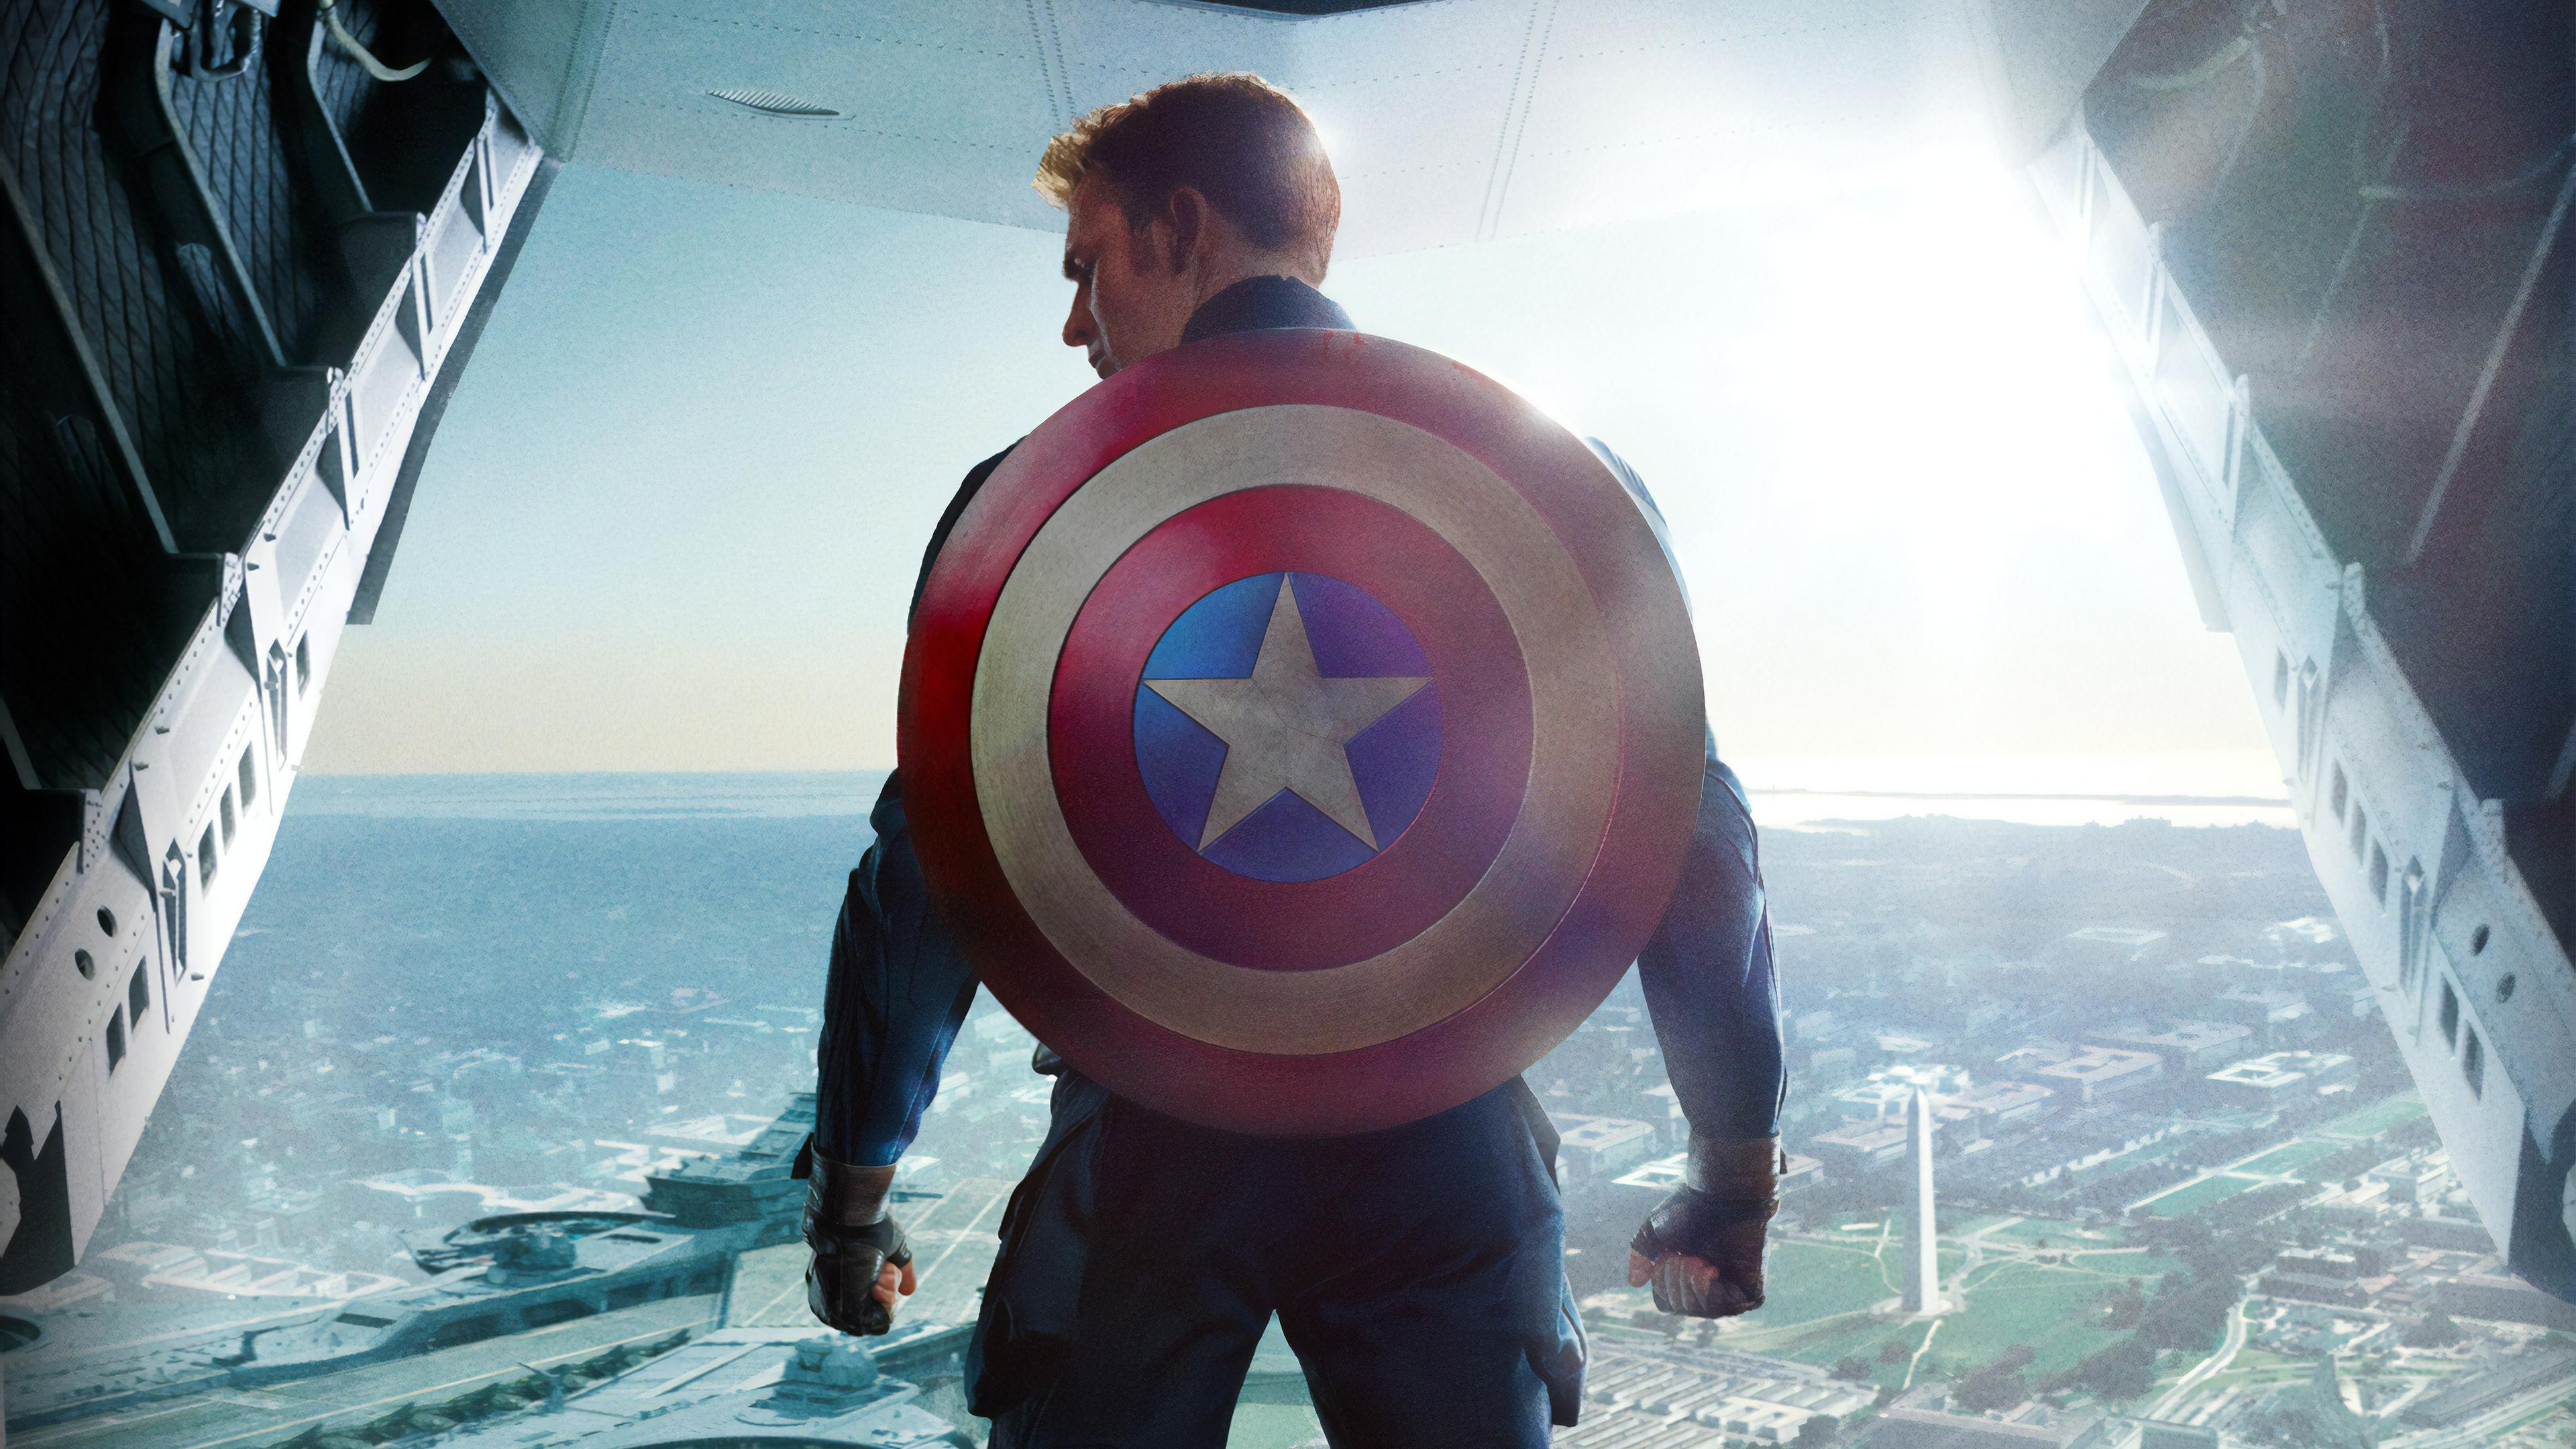 Captain America The Winter Soldier 4k Ultra Hd Wallpaper